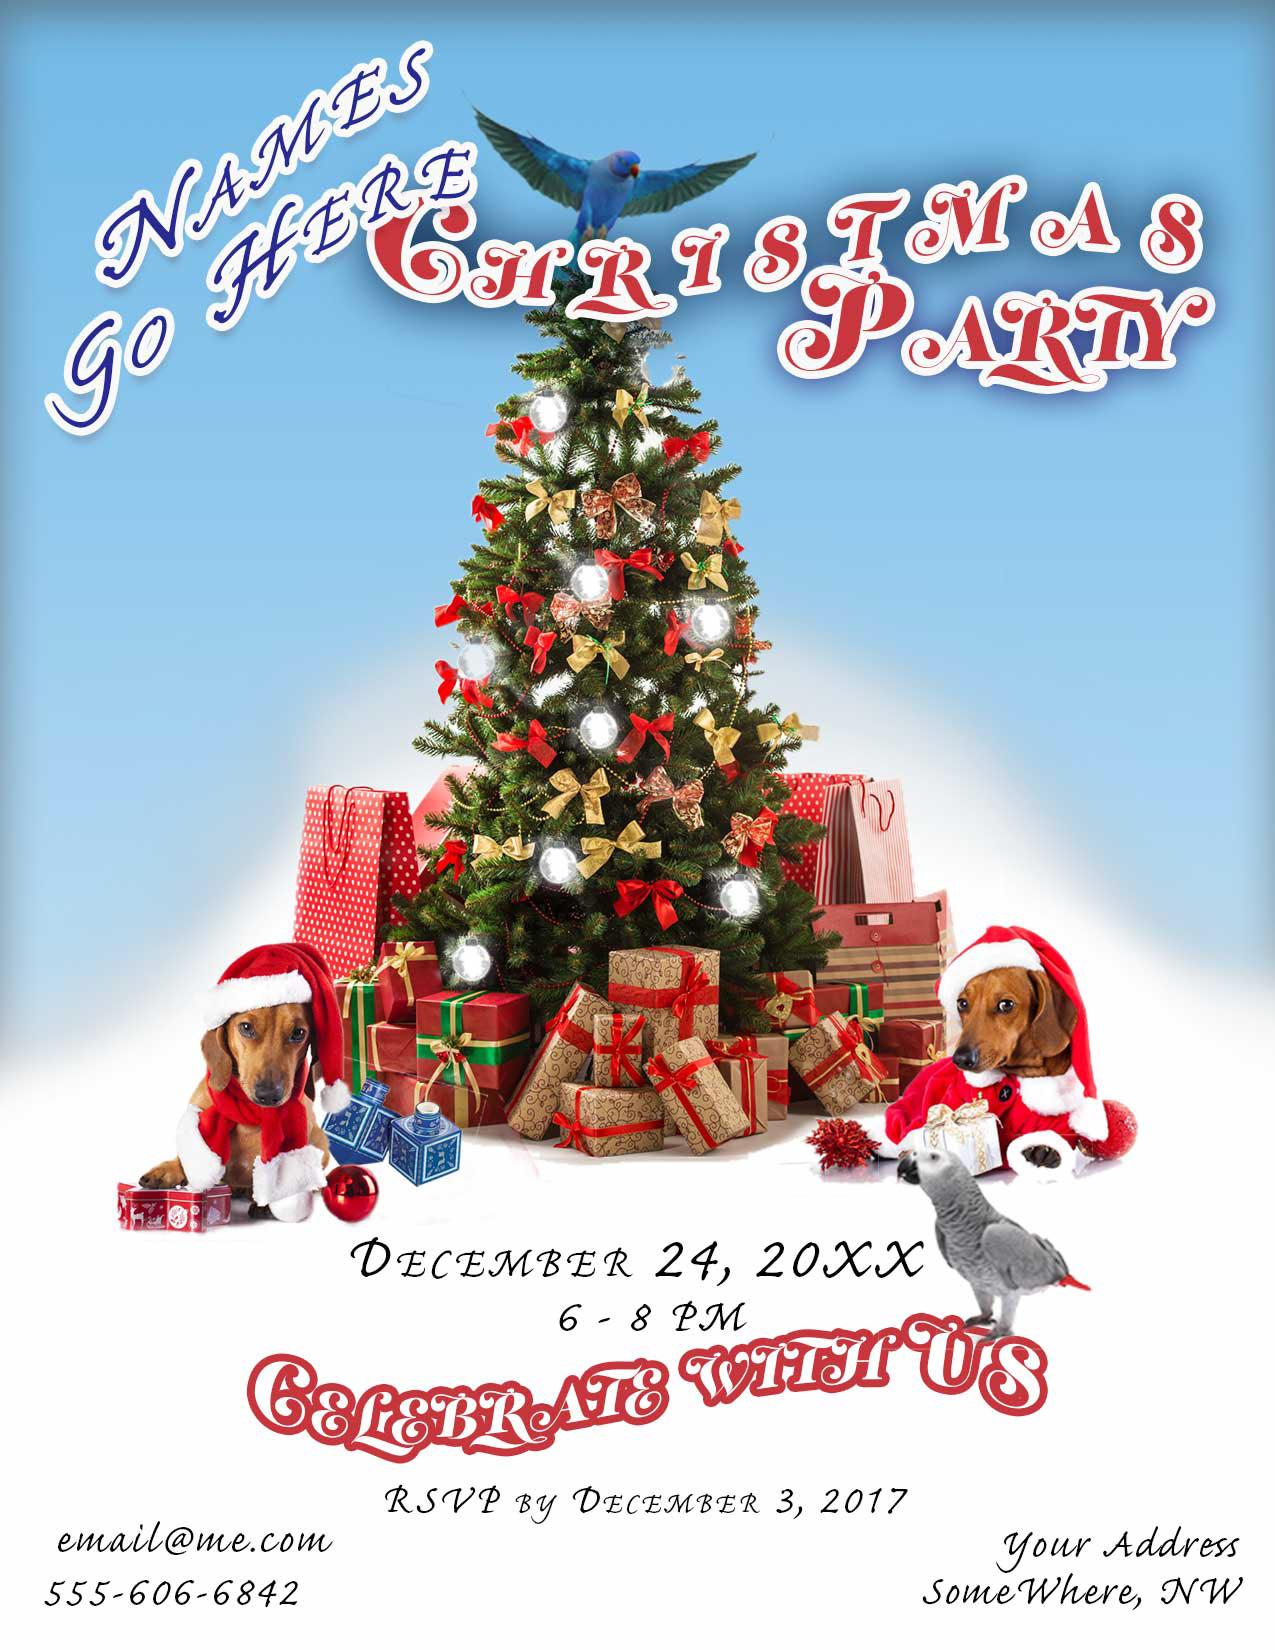 j milano designs web portfolio christmas party evite